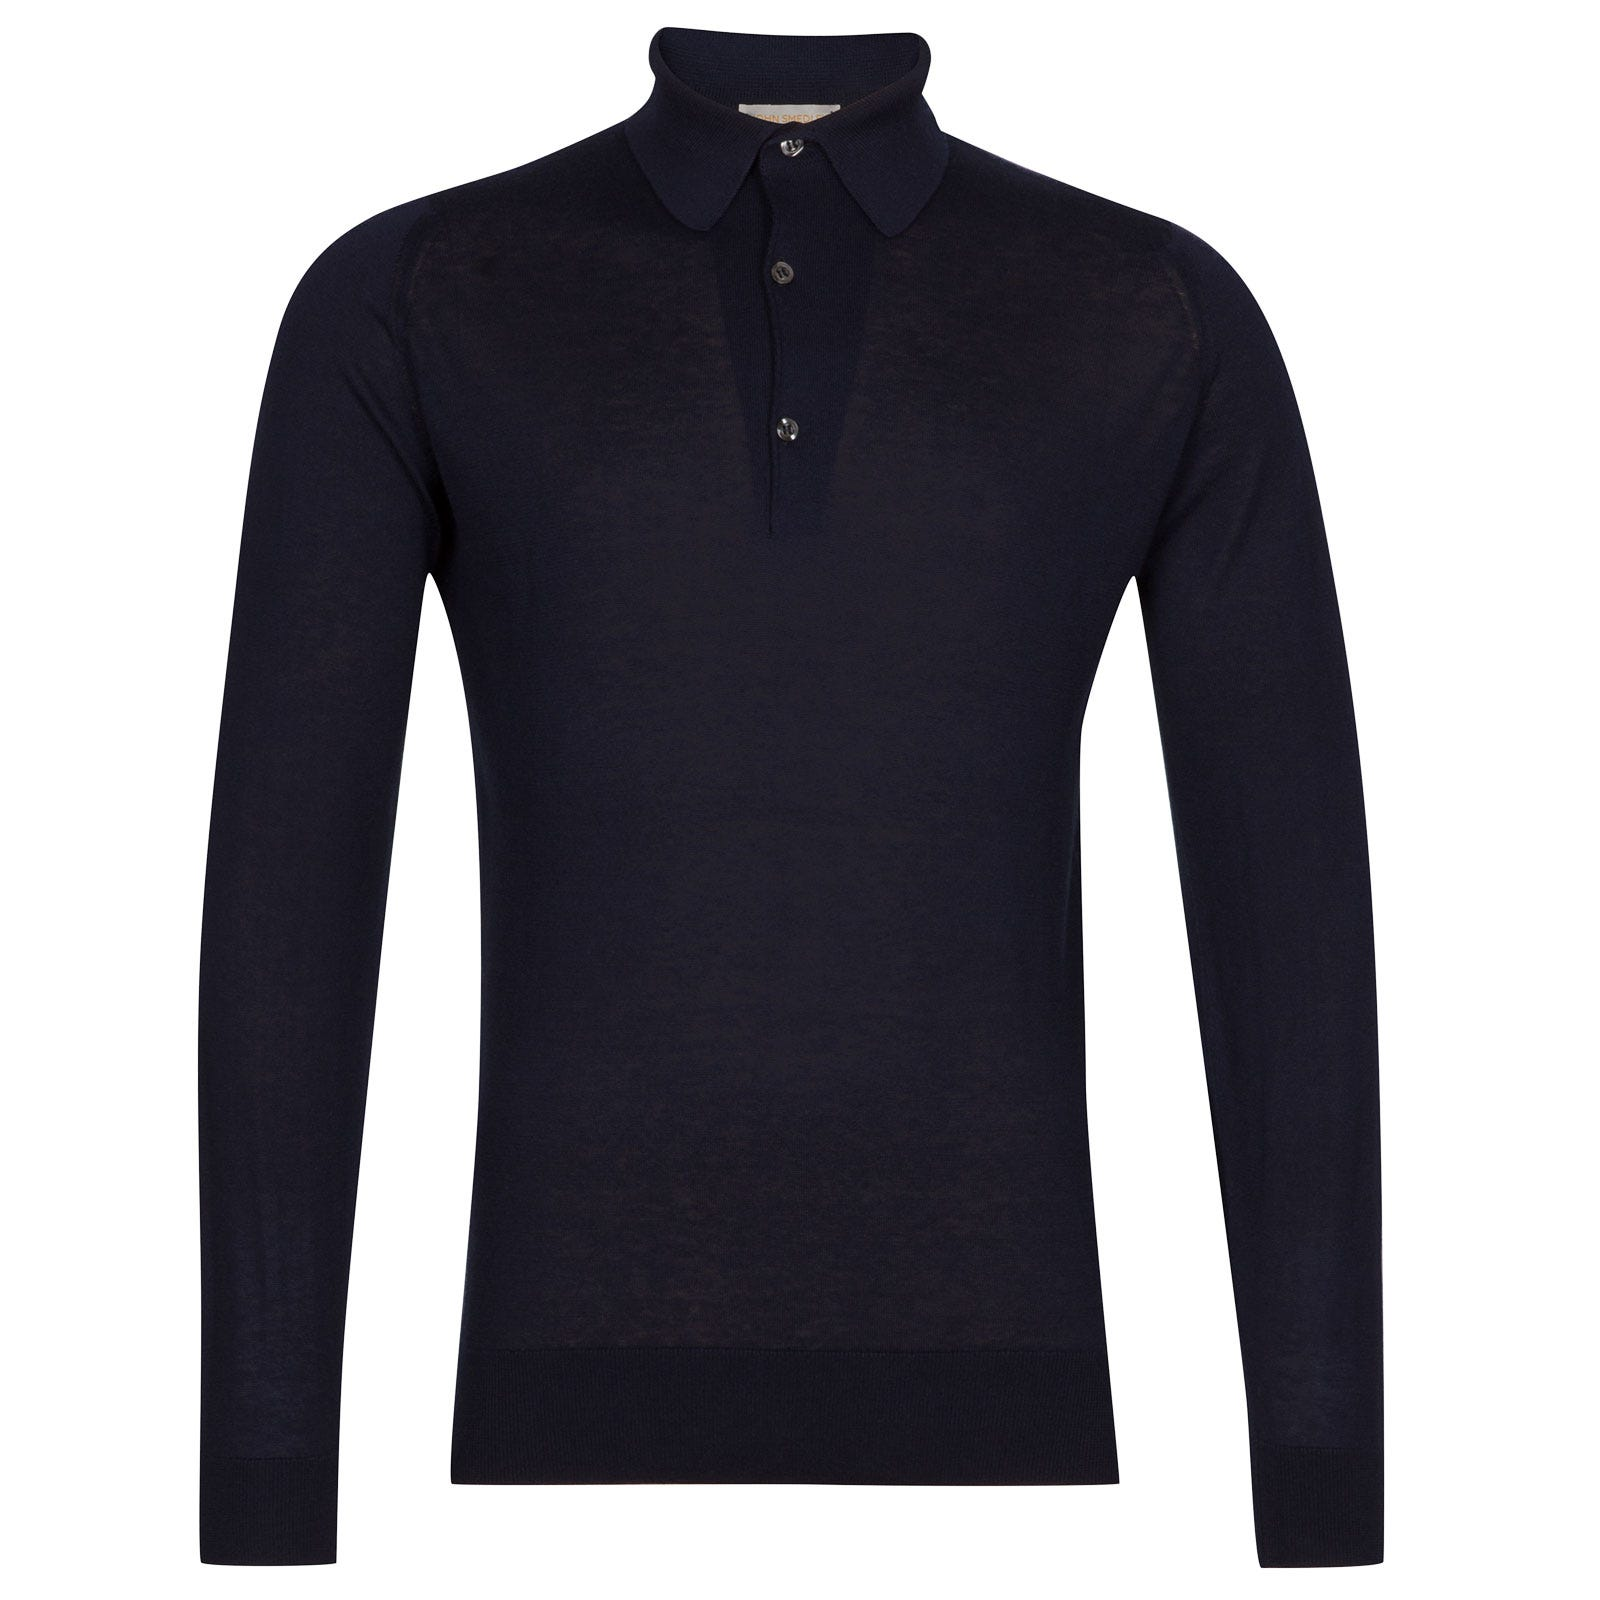 John Smedley Lanlay Sea Island Cotton and Cashmere Shirt in Navy-XL